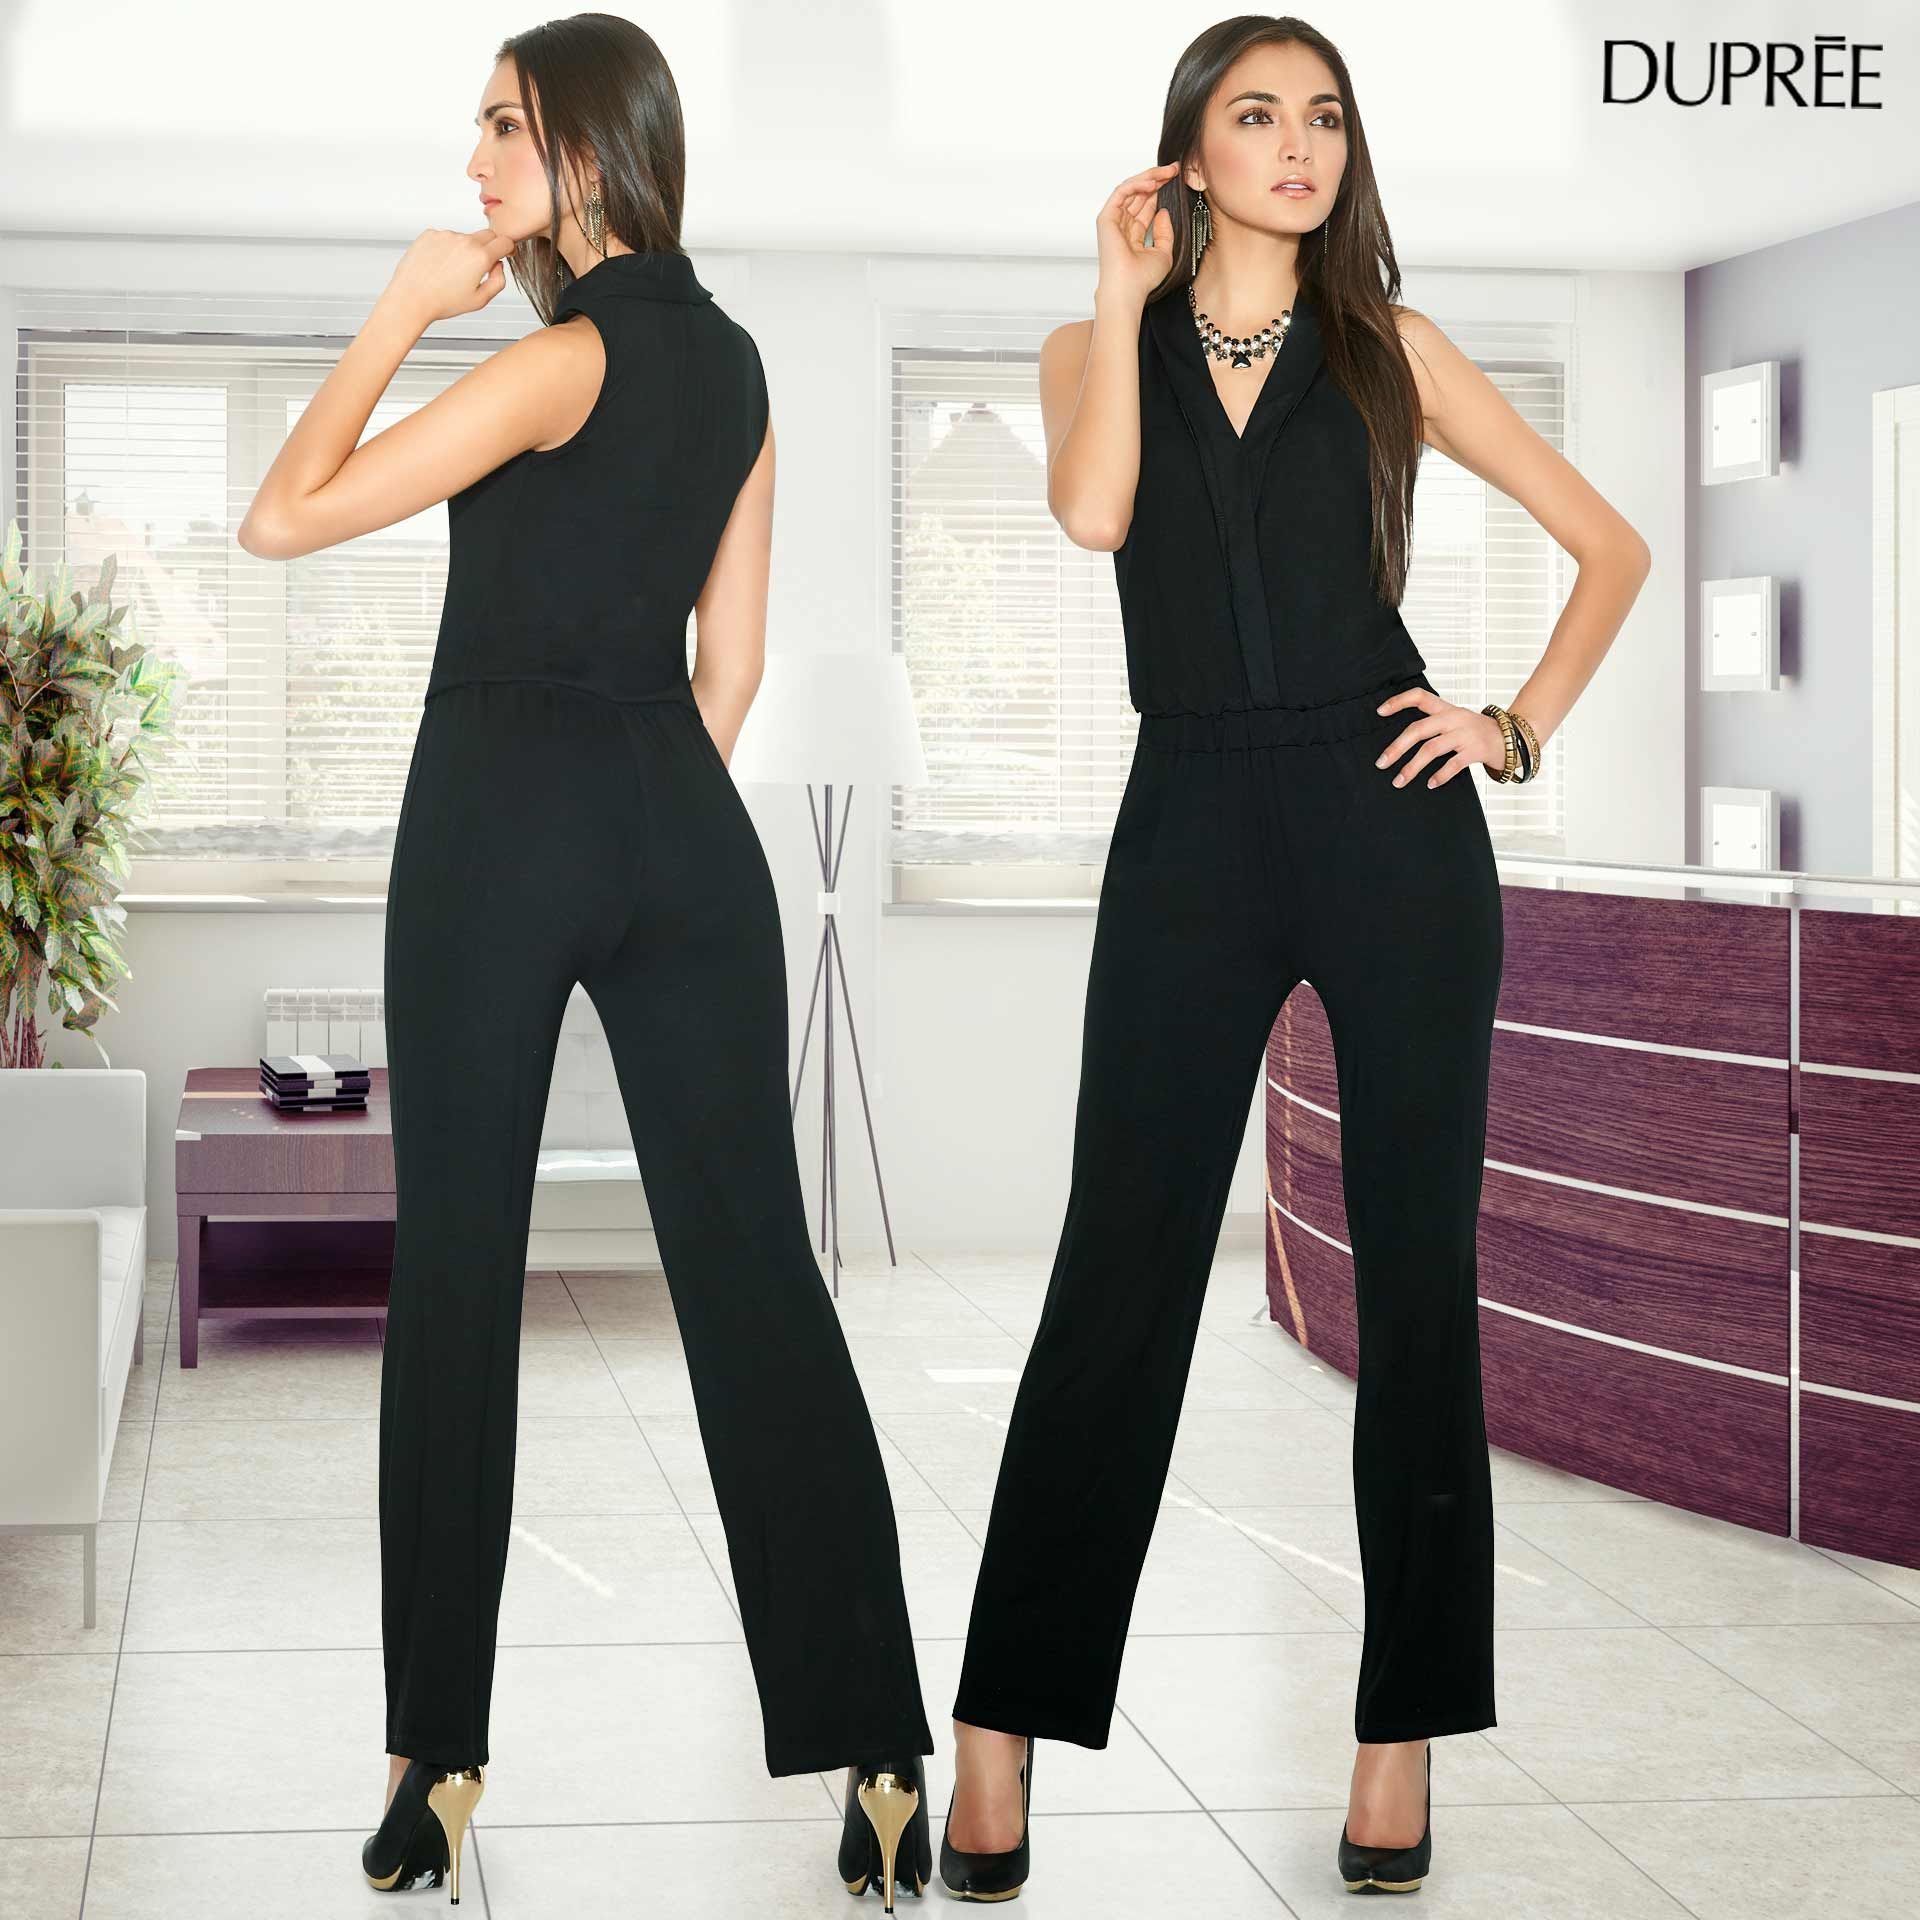 c263c971075 Enterizos elegantes. Moda femenina. Dupree Colombia Moños Para Mujer